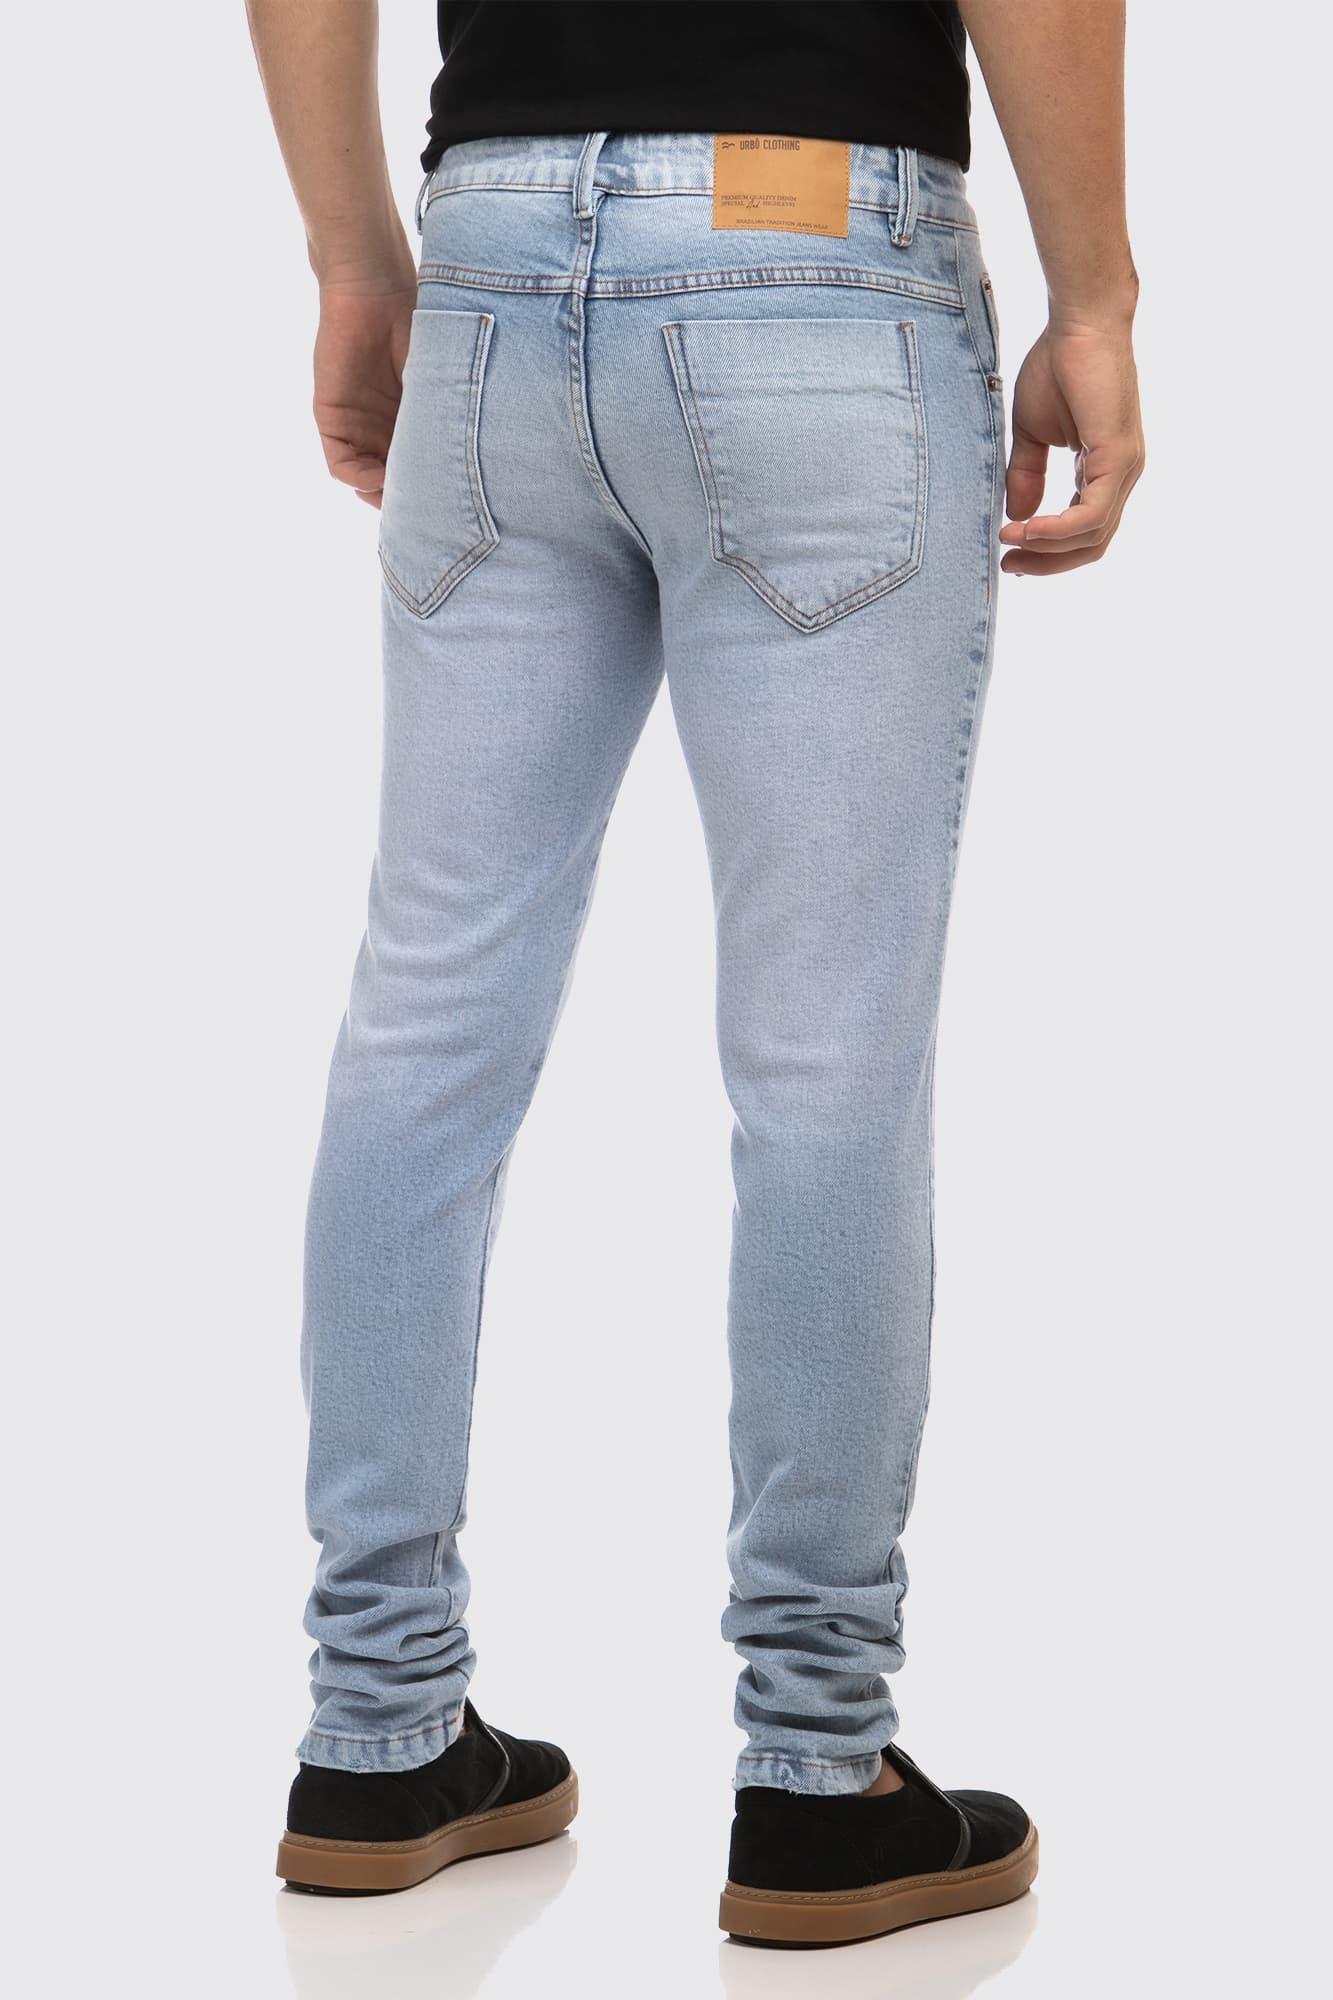 Calça Jeans New Age Light